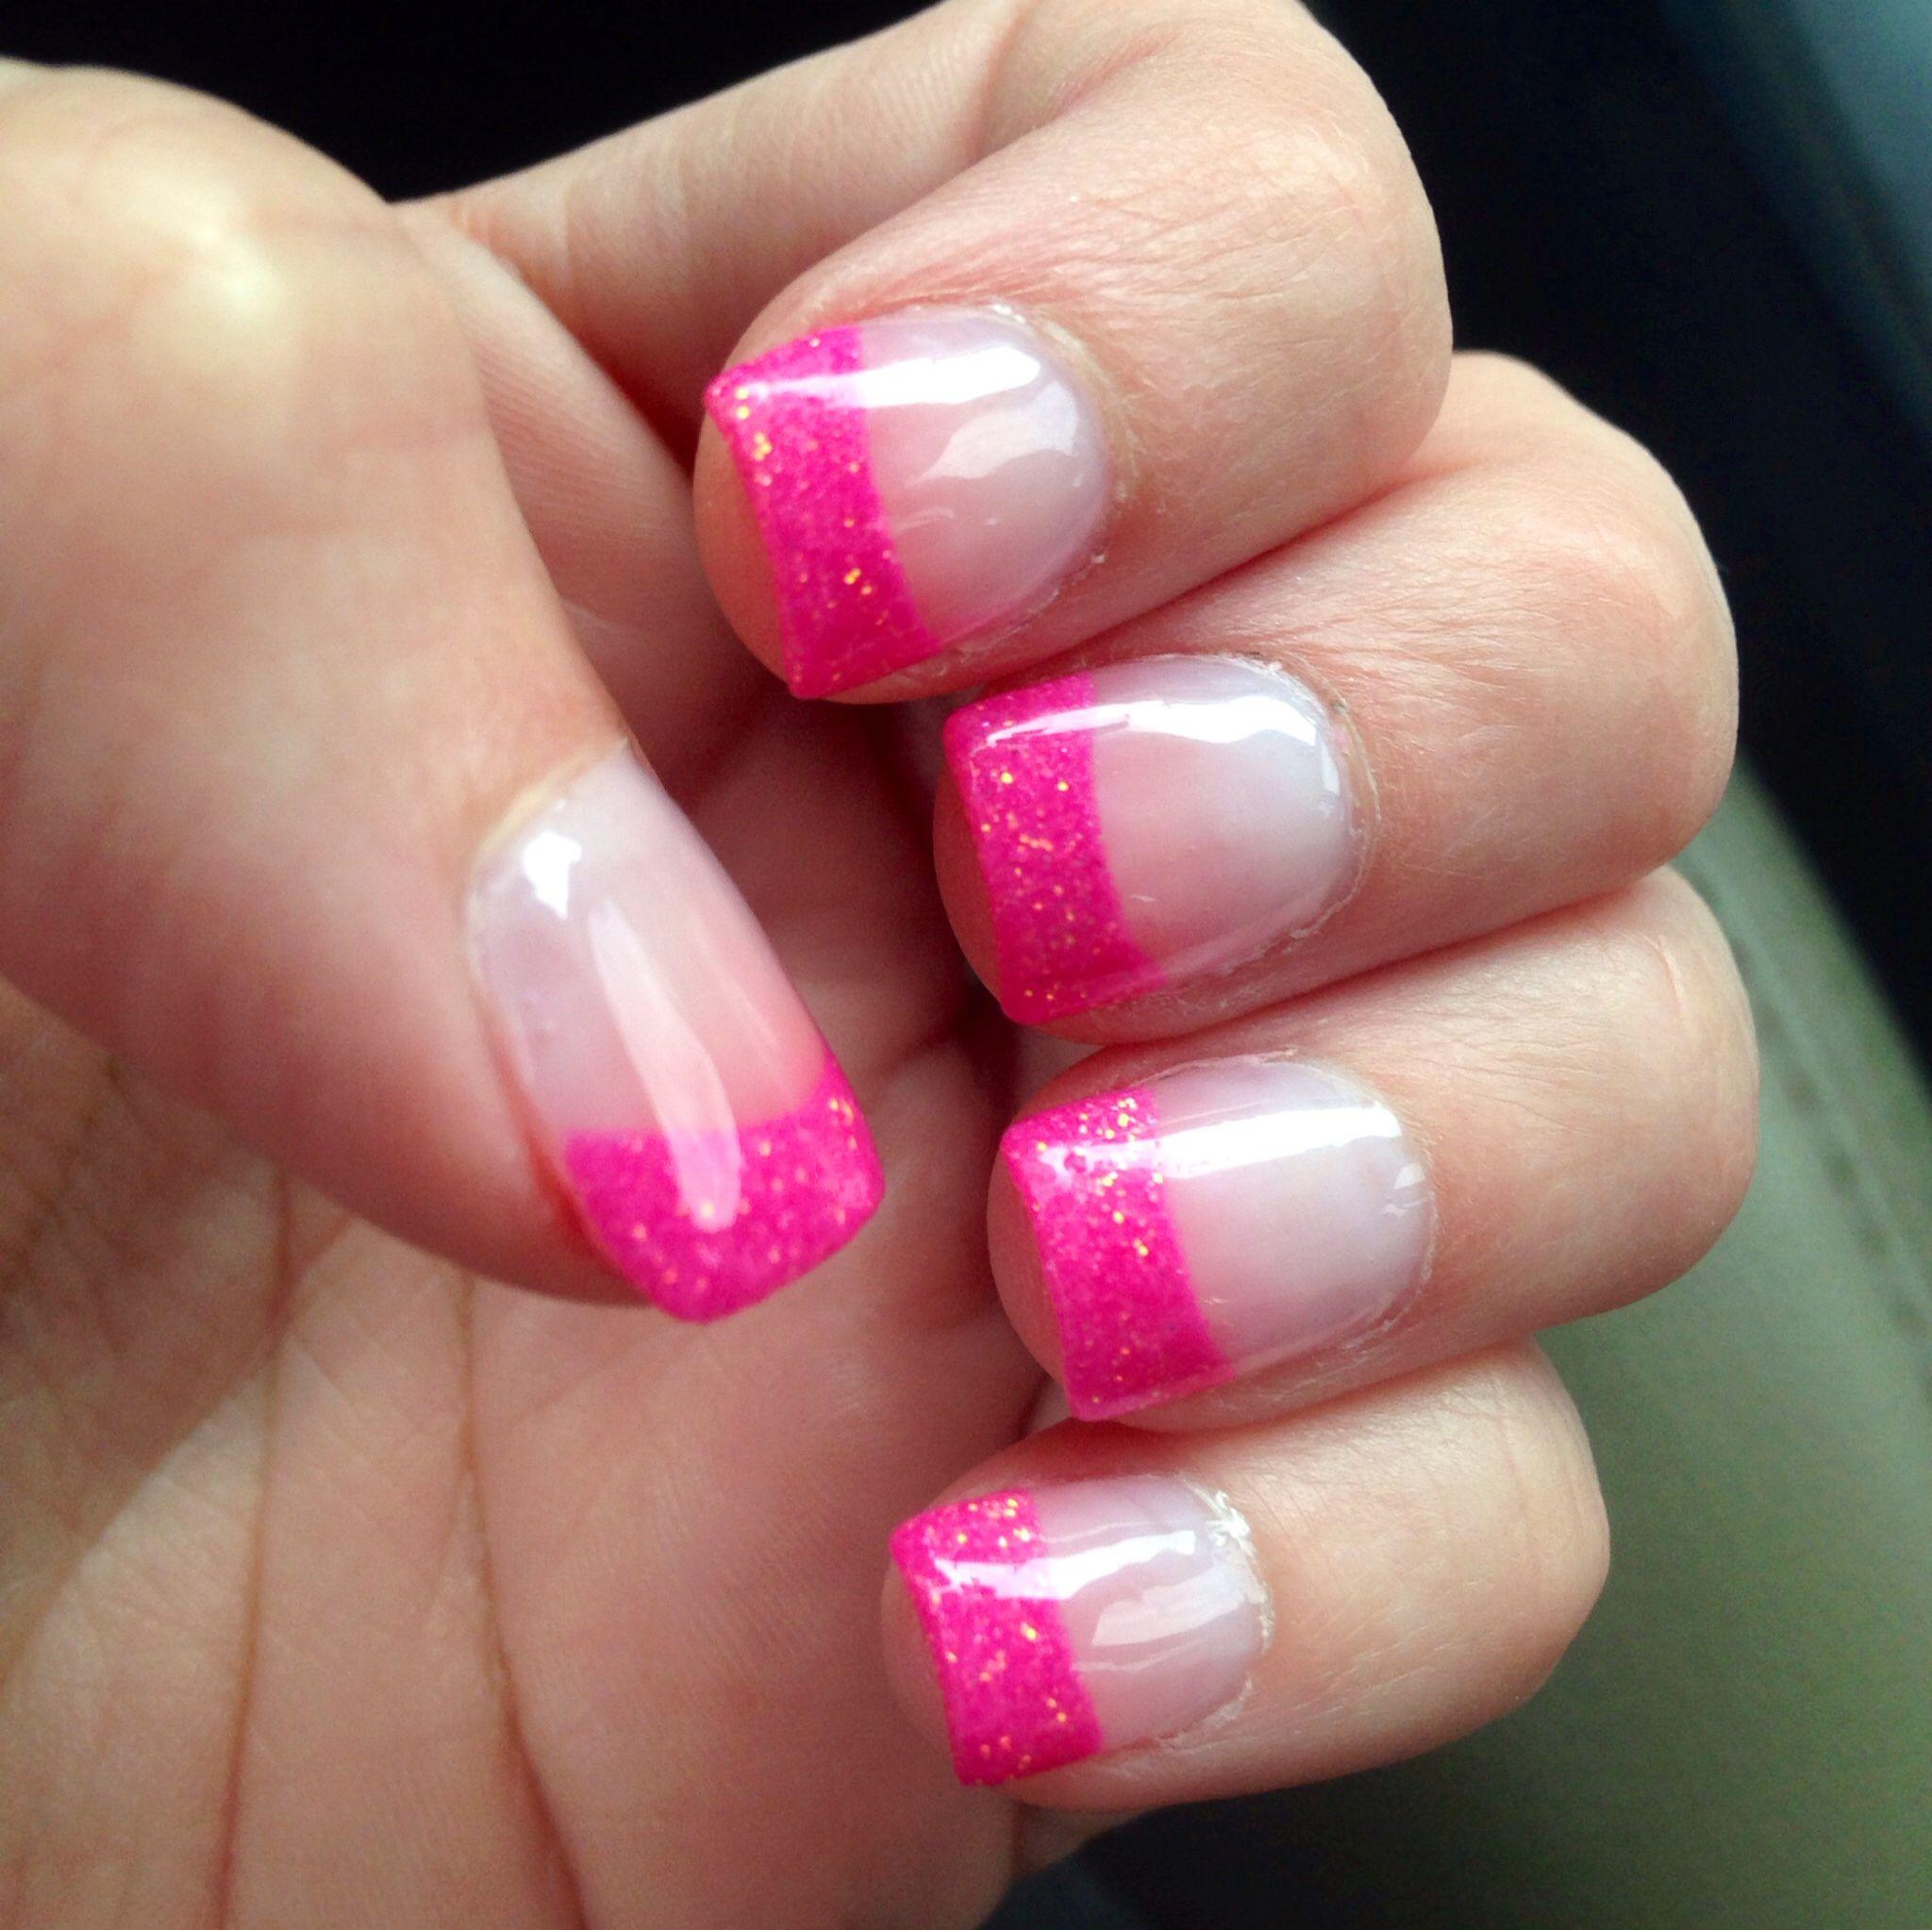 Pink glitter tips! Solar nails. | Nail File | Pinterest | Pink ...